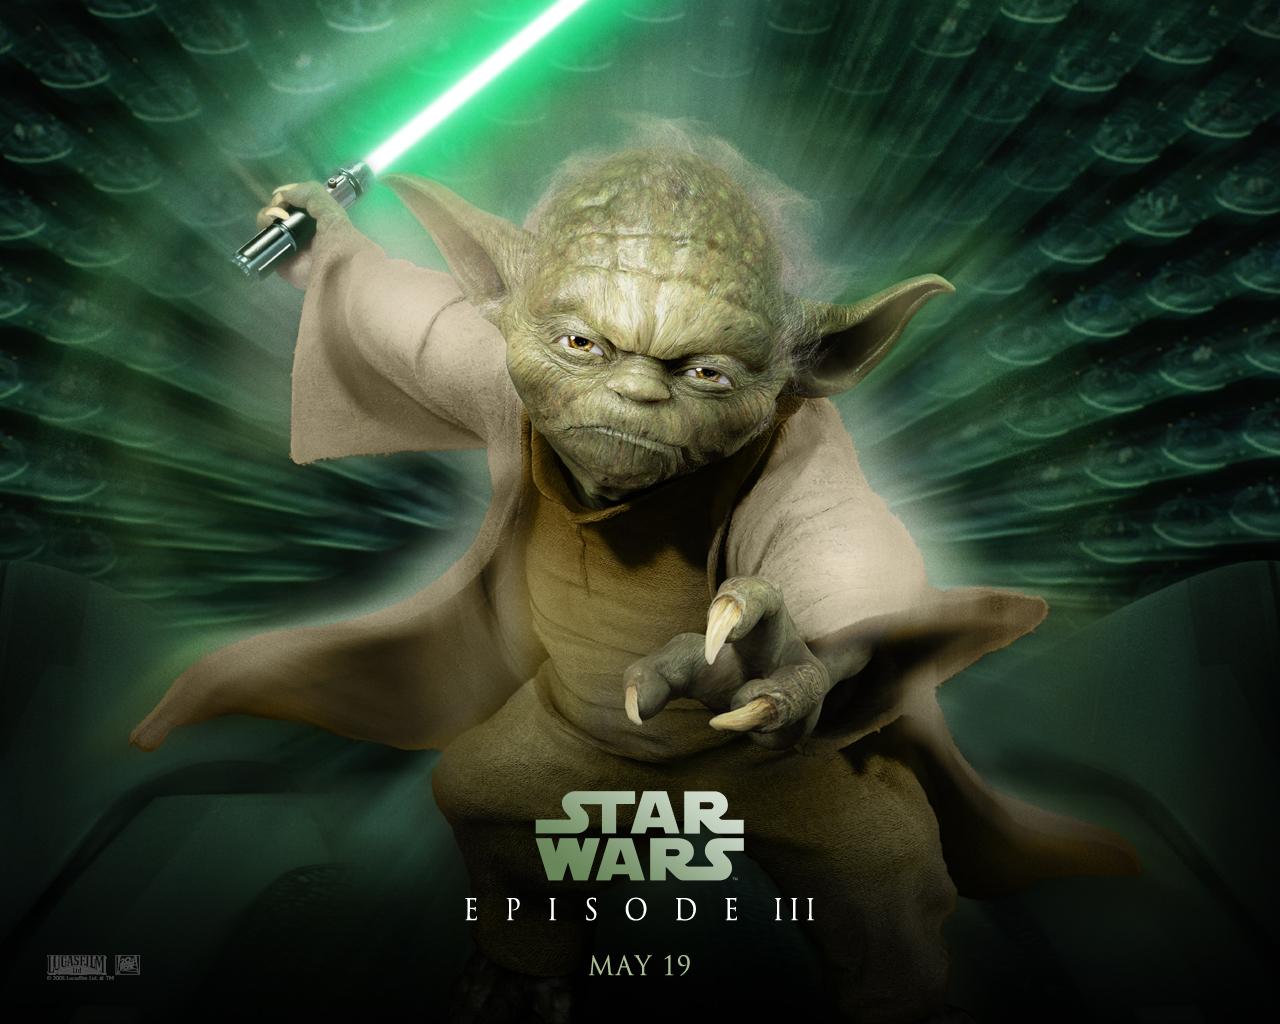 Wallpaper Maitre Yoda Star Wars